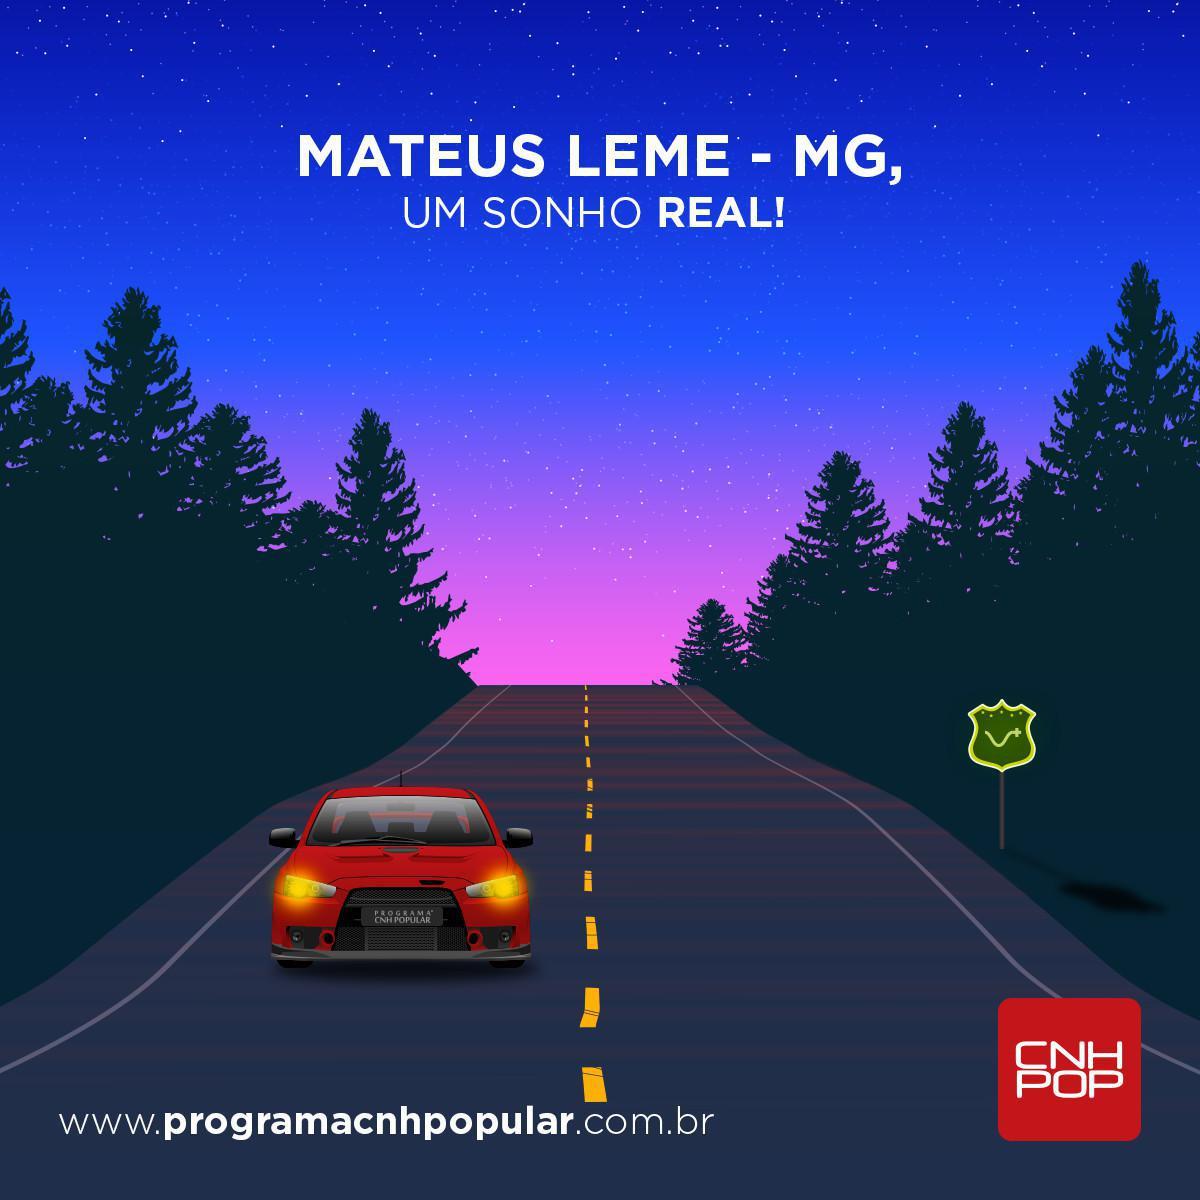 MATEUS LEME - SOMENTE NESTE FINAL DE SEMANA!